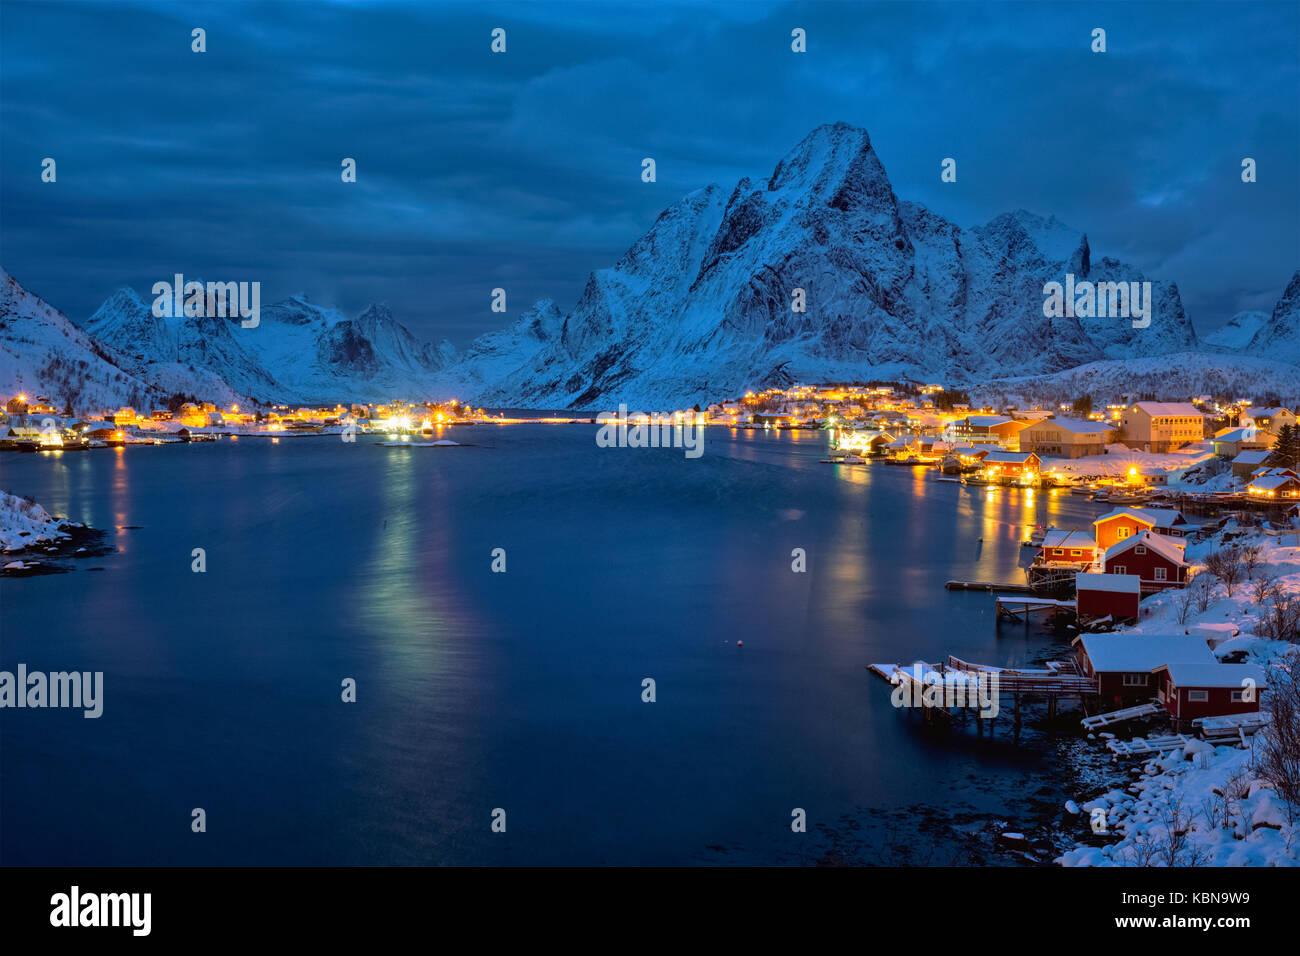 Reine village en la noche. Las islas Lofoten, Noruega Imagen De Stock